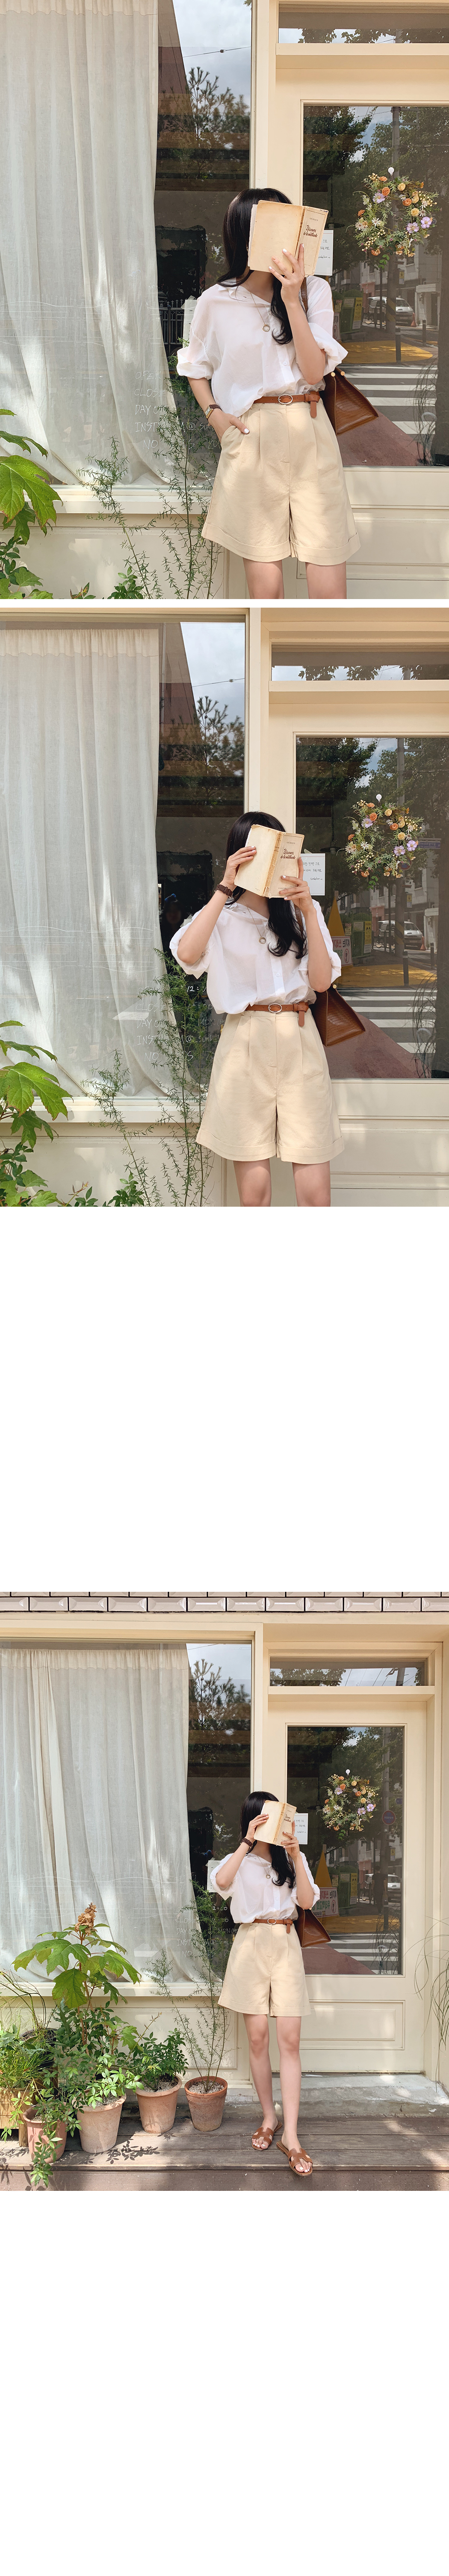 Cabbrapin chin 5 part belt pants